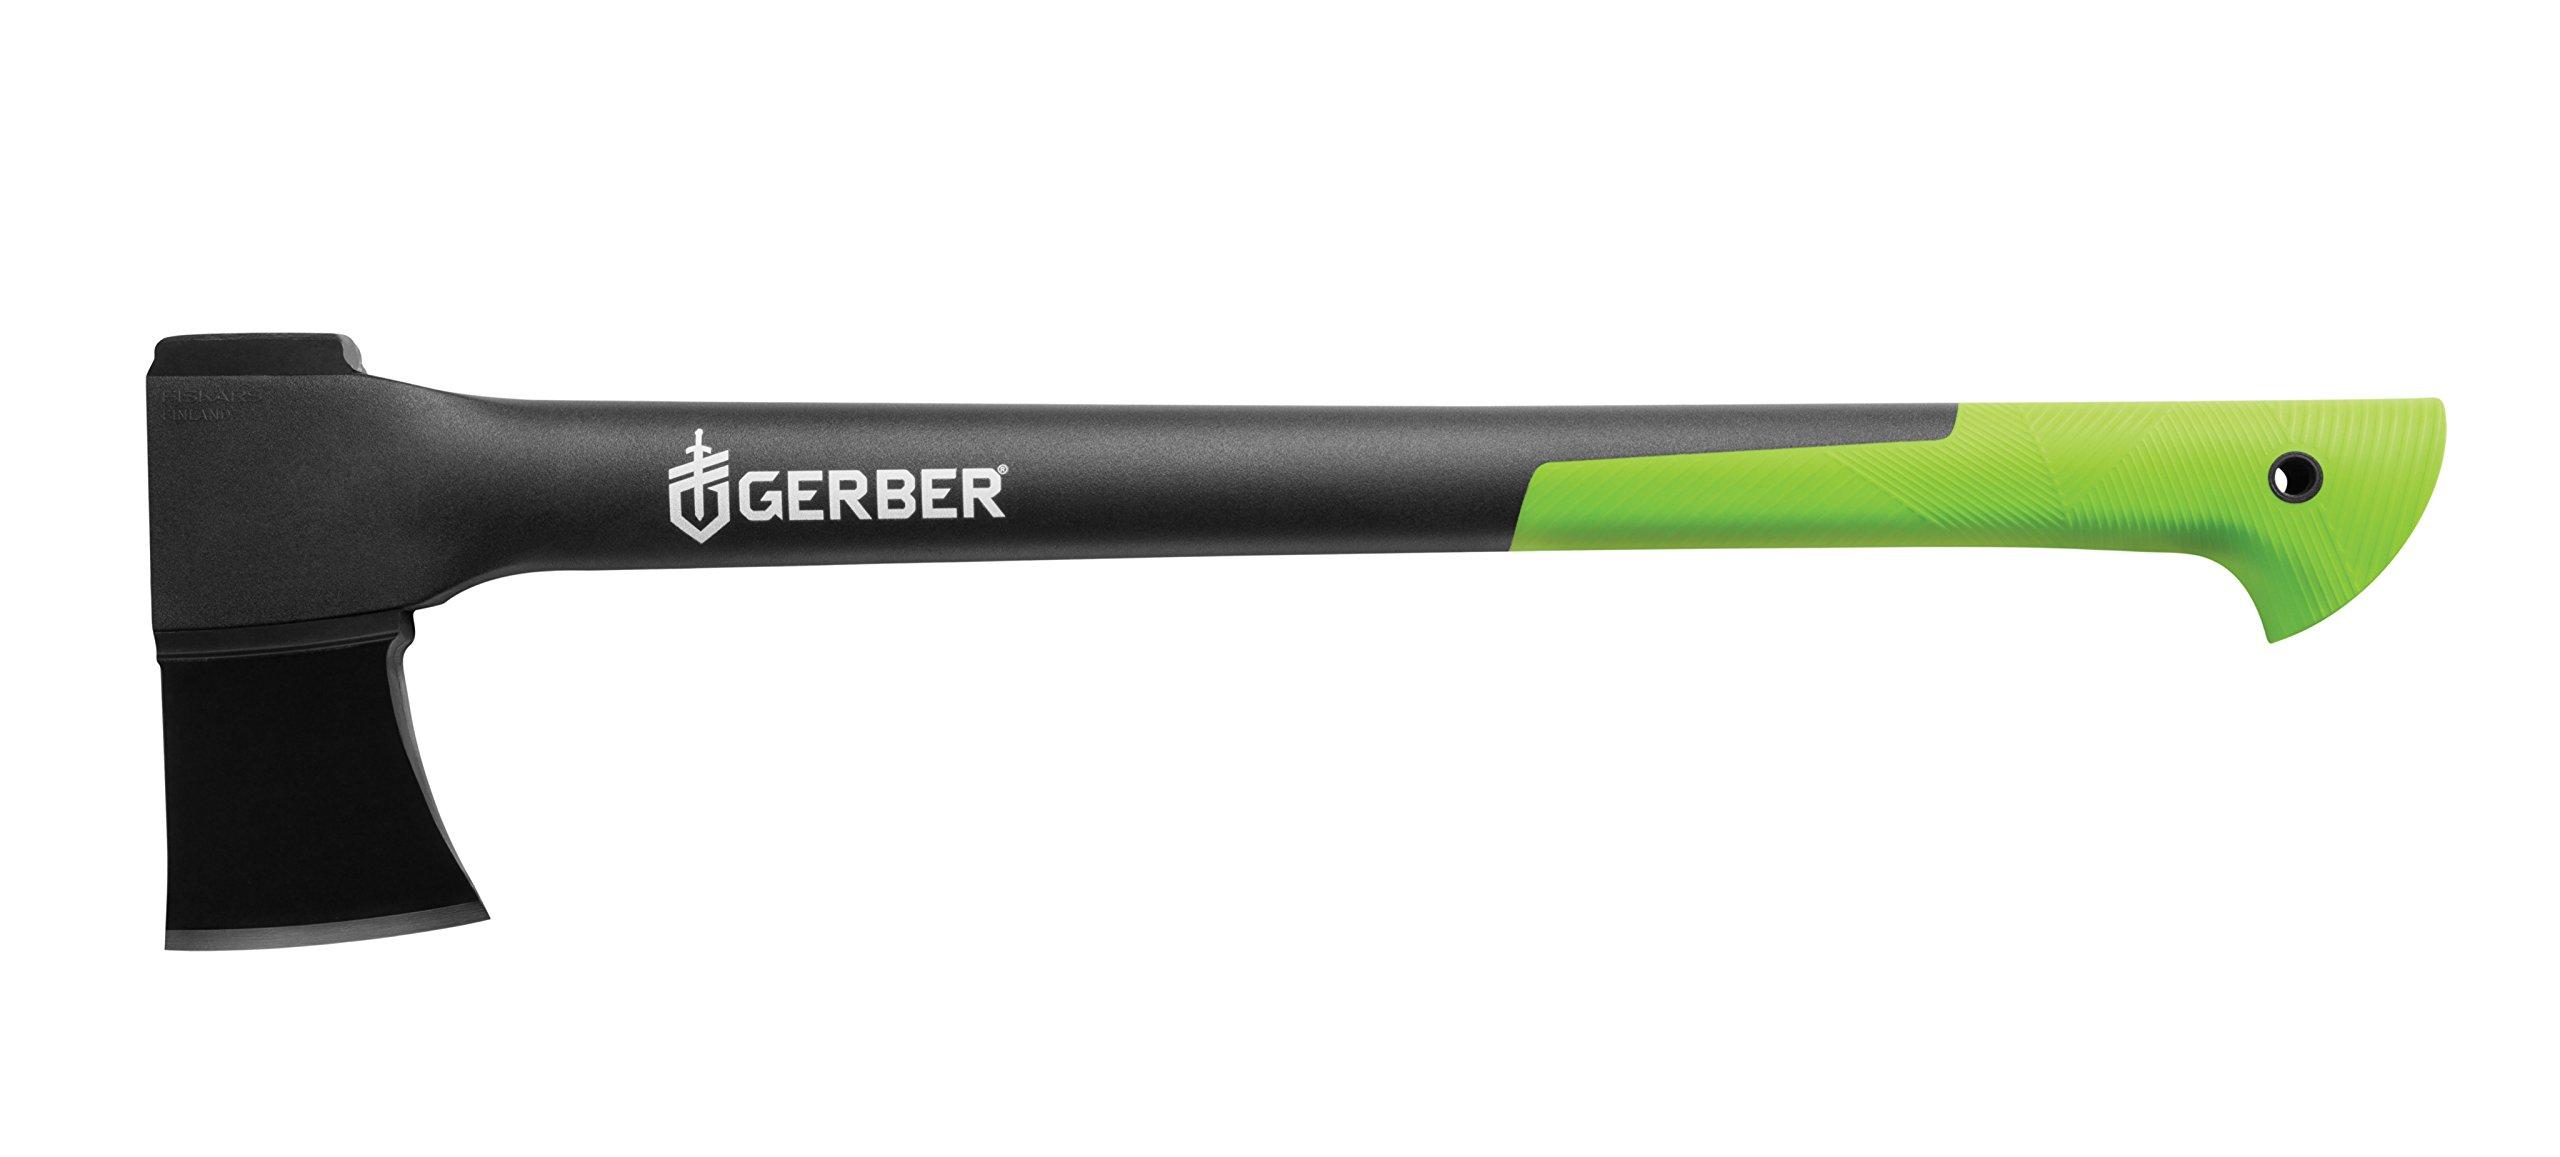 Gerber 23.5-Inch Axe [31-002651] by Gerber Blades (Image #1)